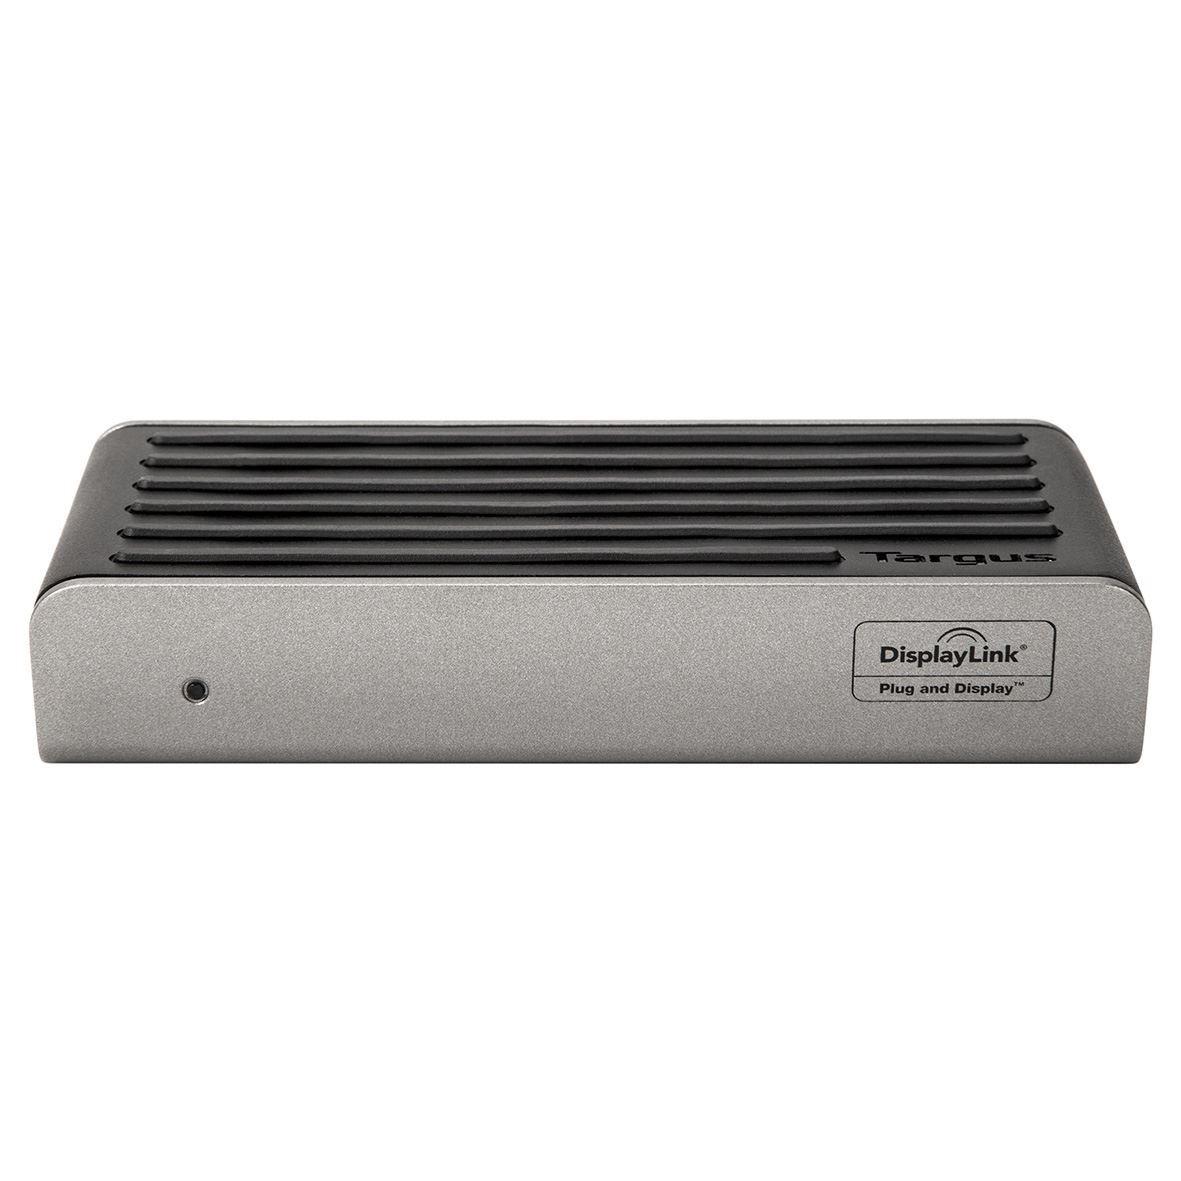 Targus 2K Universal Docking Station USB 3.0 Single 2K or Dual HD Video DOCK120EUZ - Black